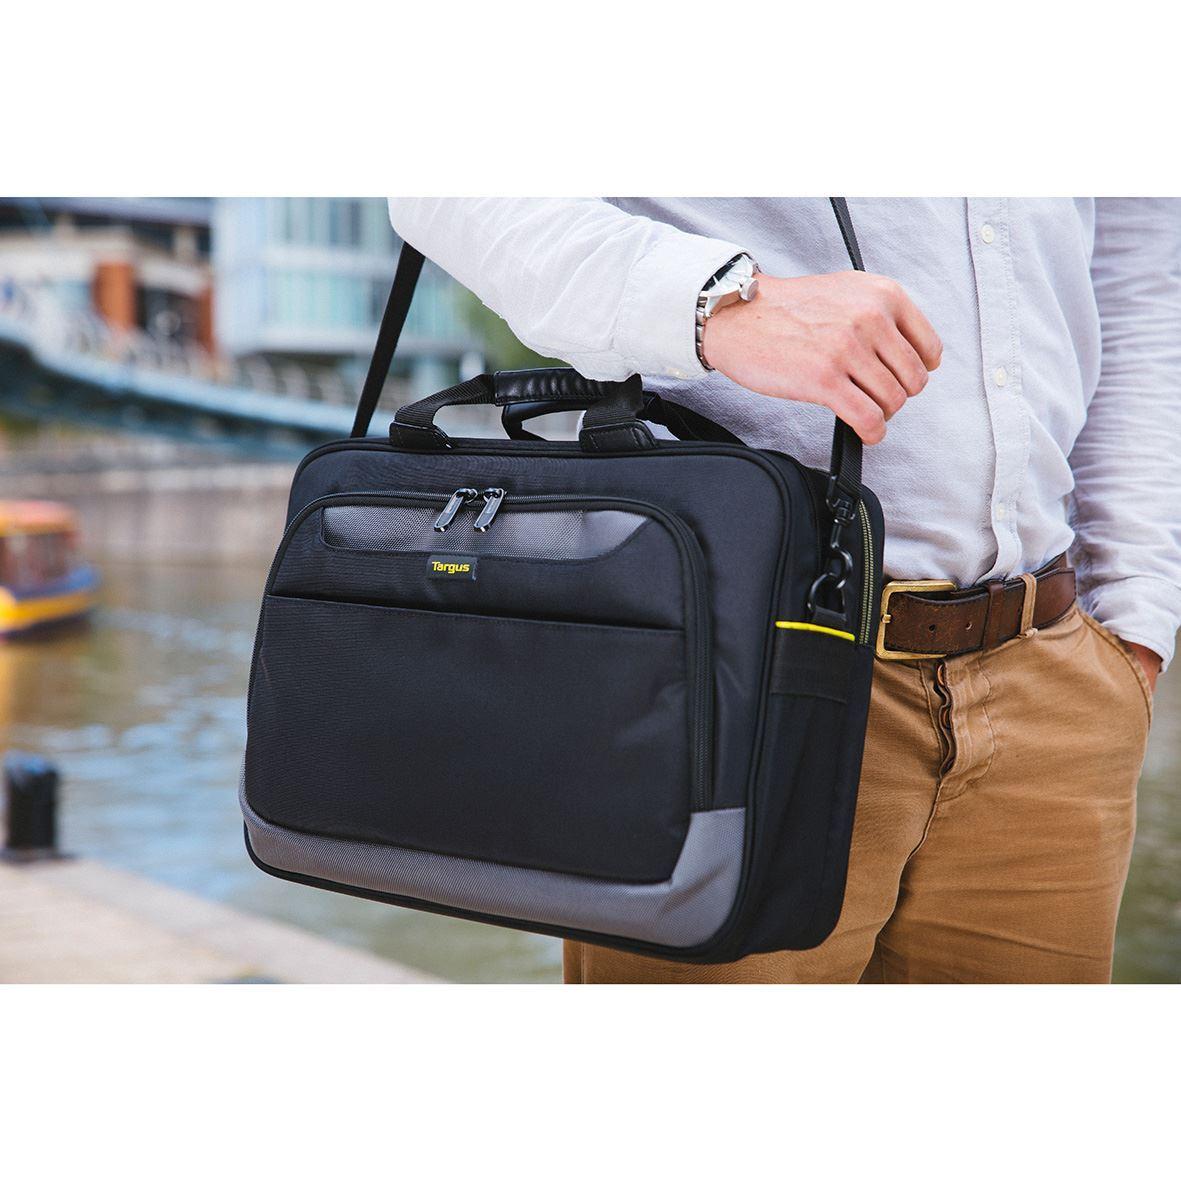 "Picture of CityGear 16-17.3"" Topload Laptop Case - Black"